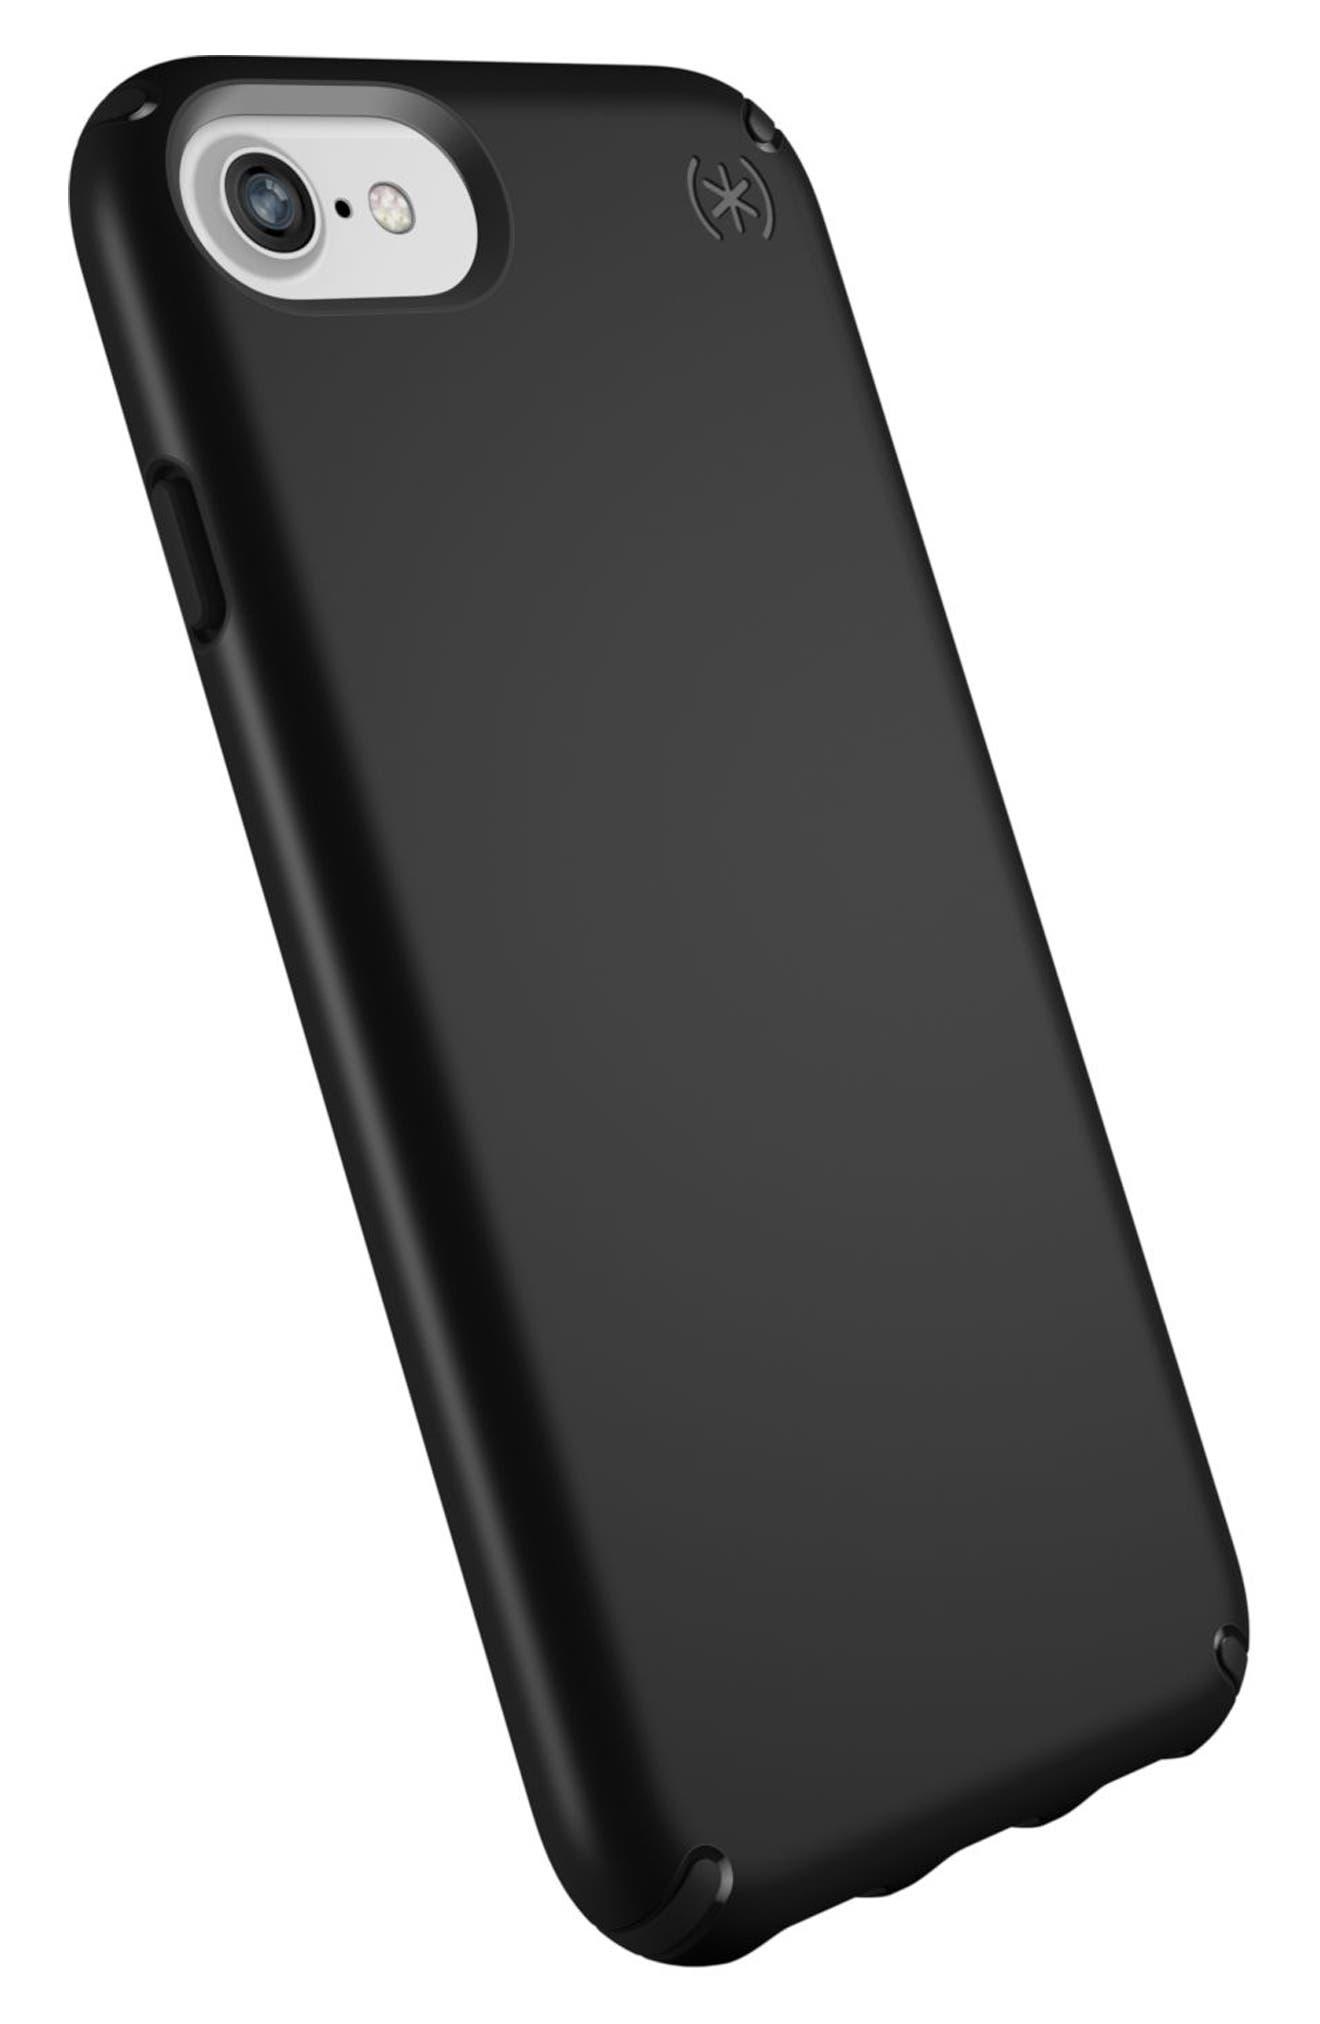 iPhone 6/6s/7/8 Case,                             Alternate thumbnail 4, color,                             Black/ Black